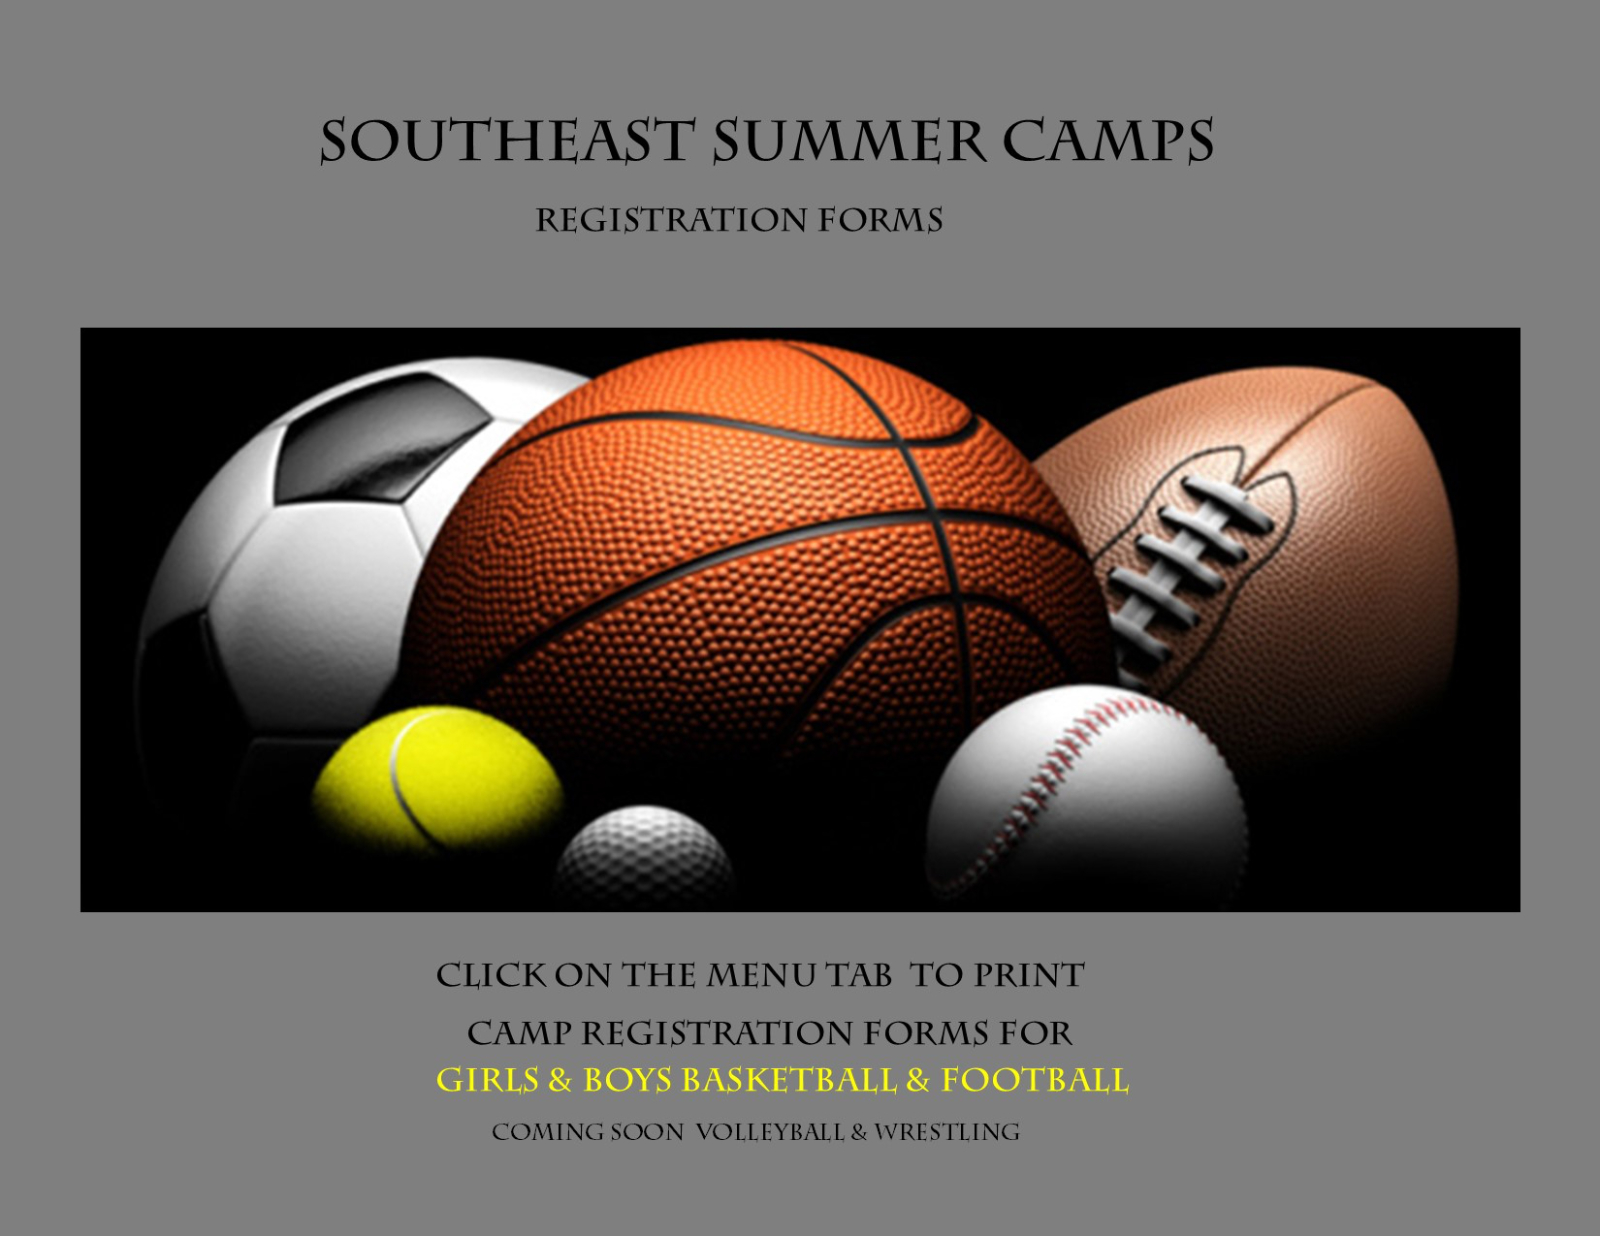 Southeast Summer Camps Registration Forms